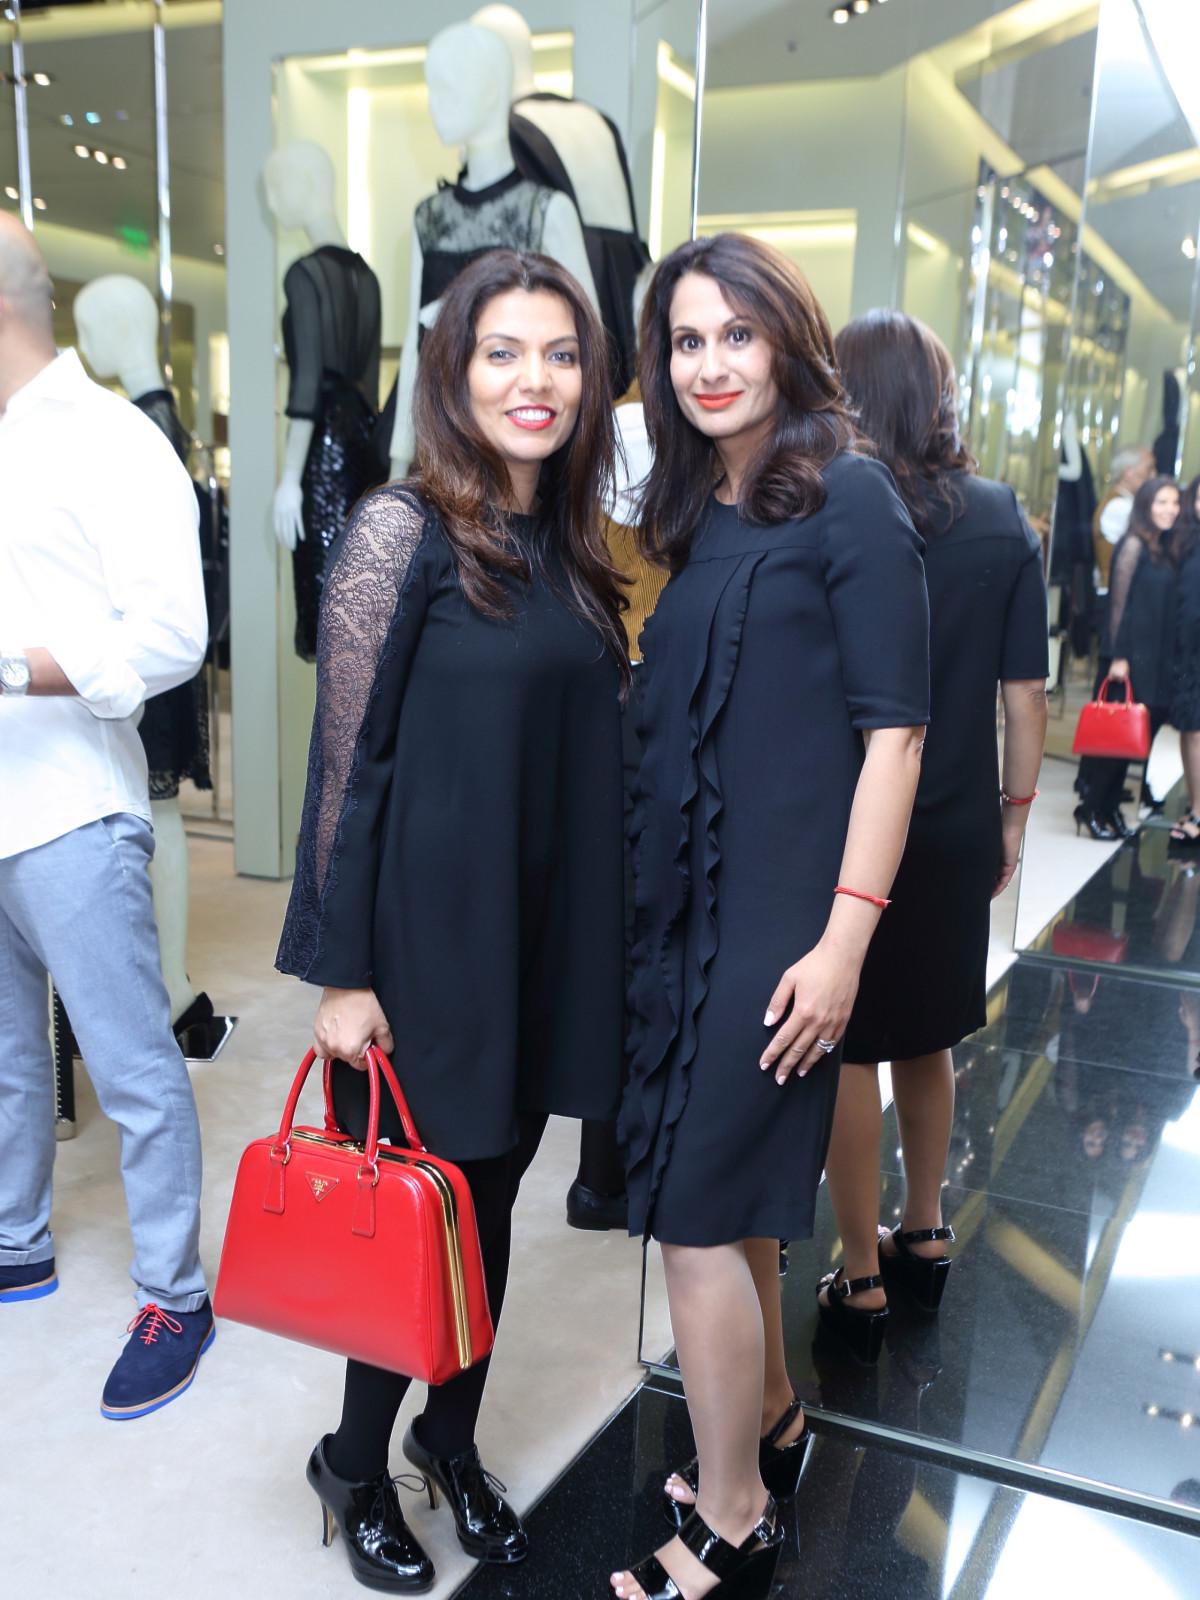 Mona Khan, Jyoti Kohli at APAHA kickoff party at Prada